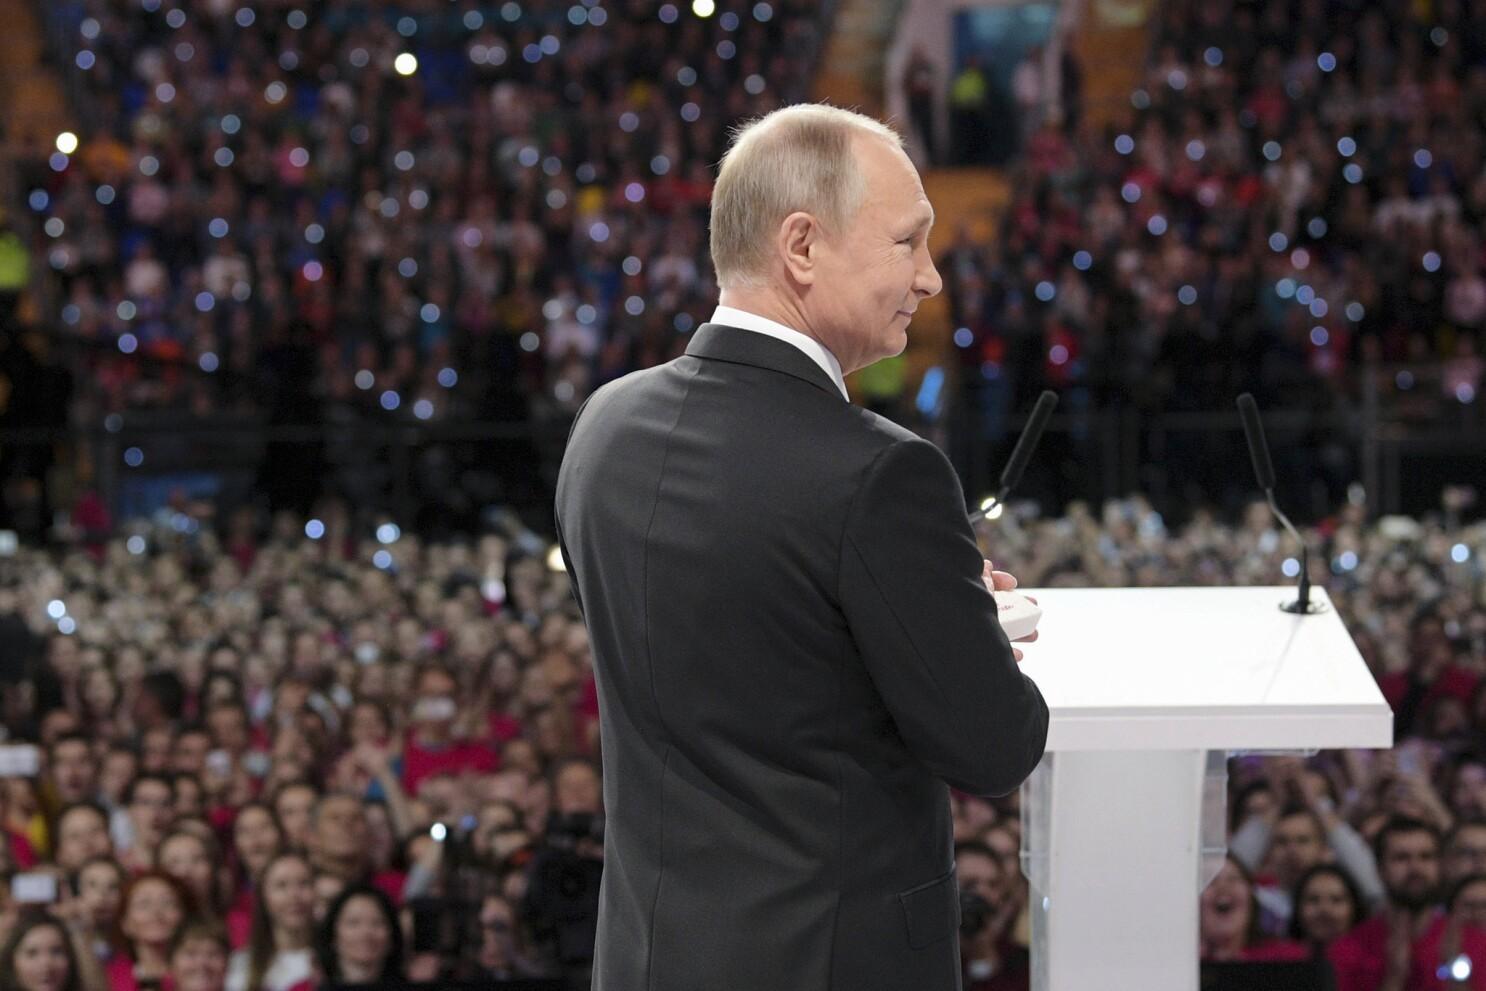 Russian President Vladimir Putin Announces Re Election Bid Los Angeles Times